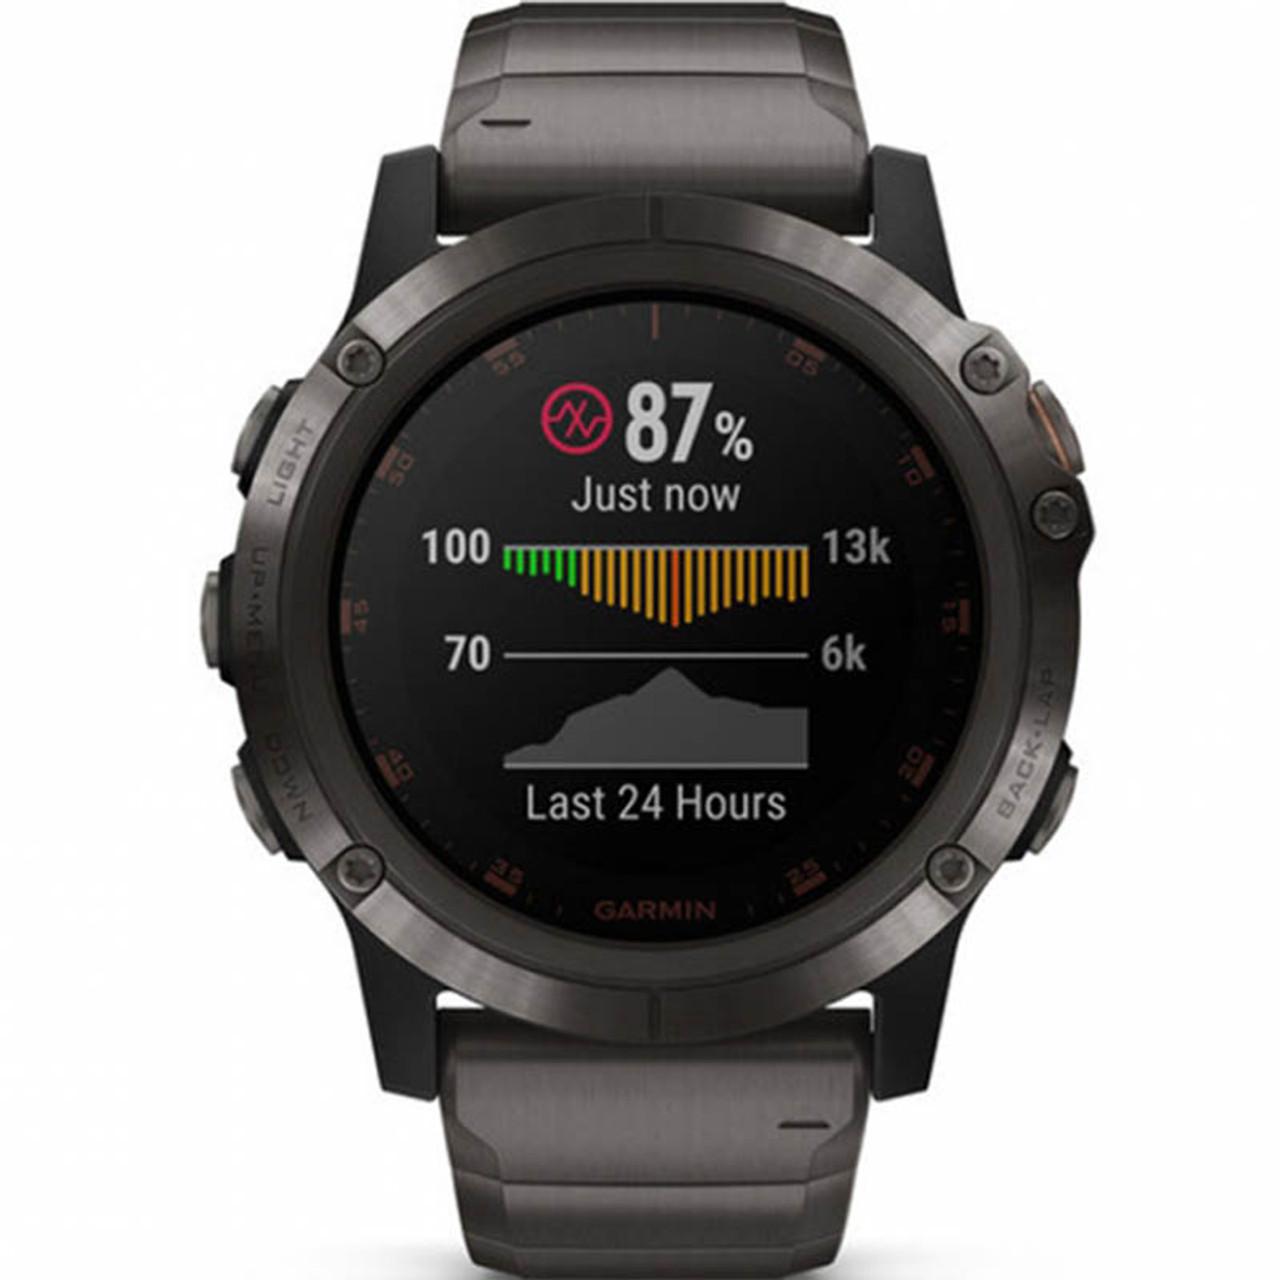 Garmin Fenix 5X Plus Sapphire Carbon Grey Titanium 51MM Watch (Free Add-On  Strap) 010-01989-05